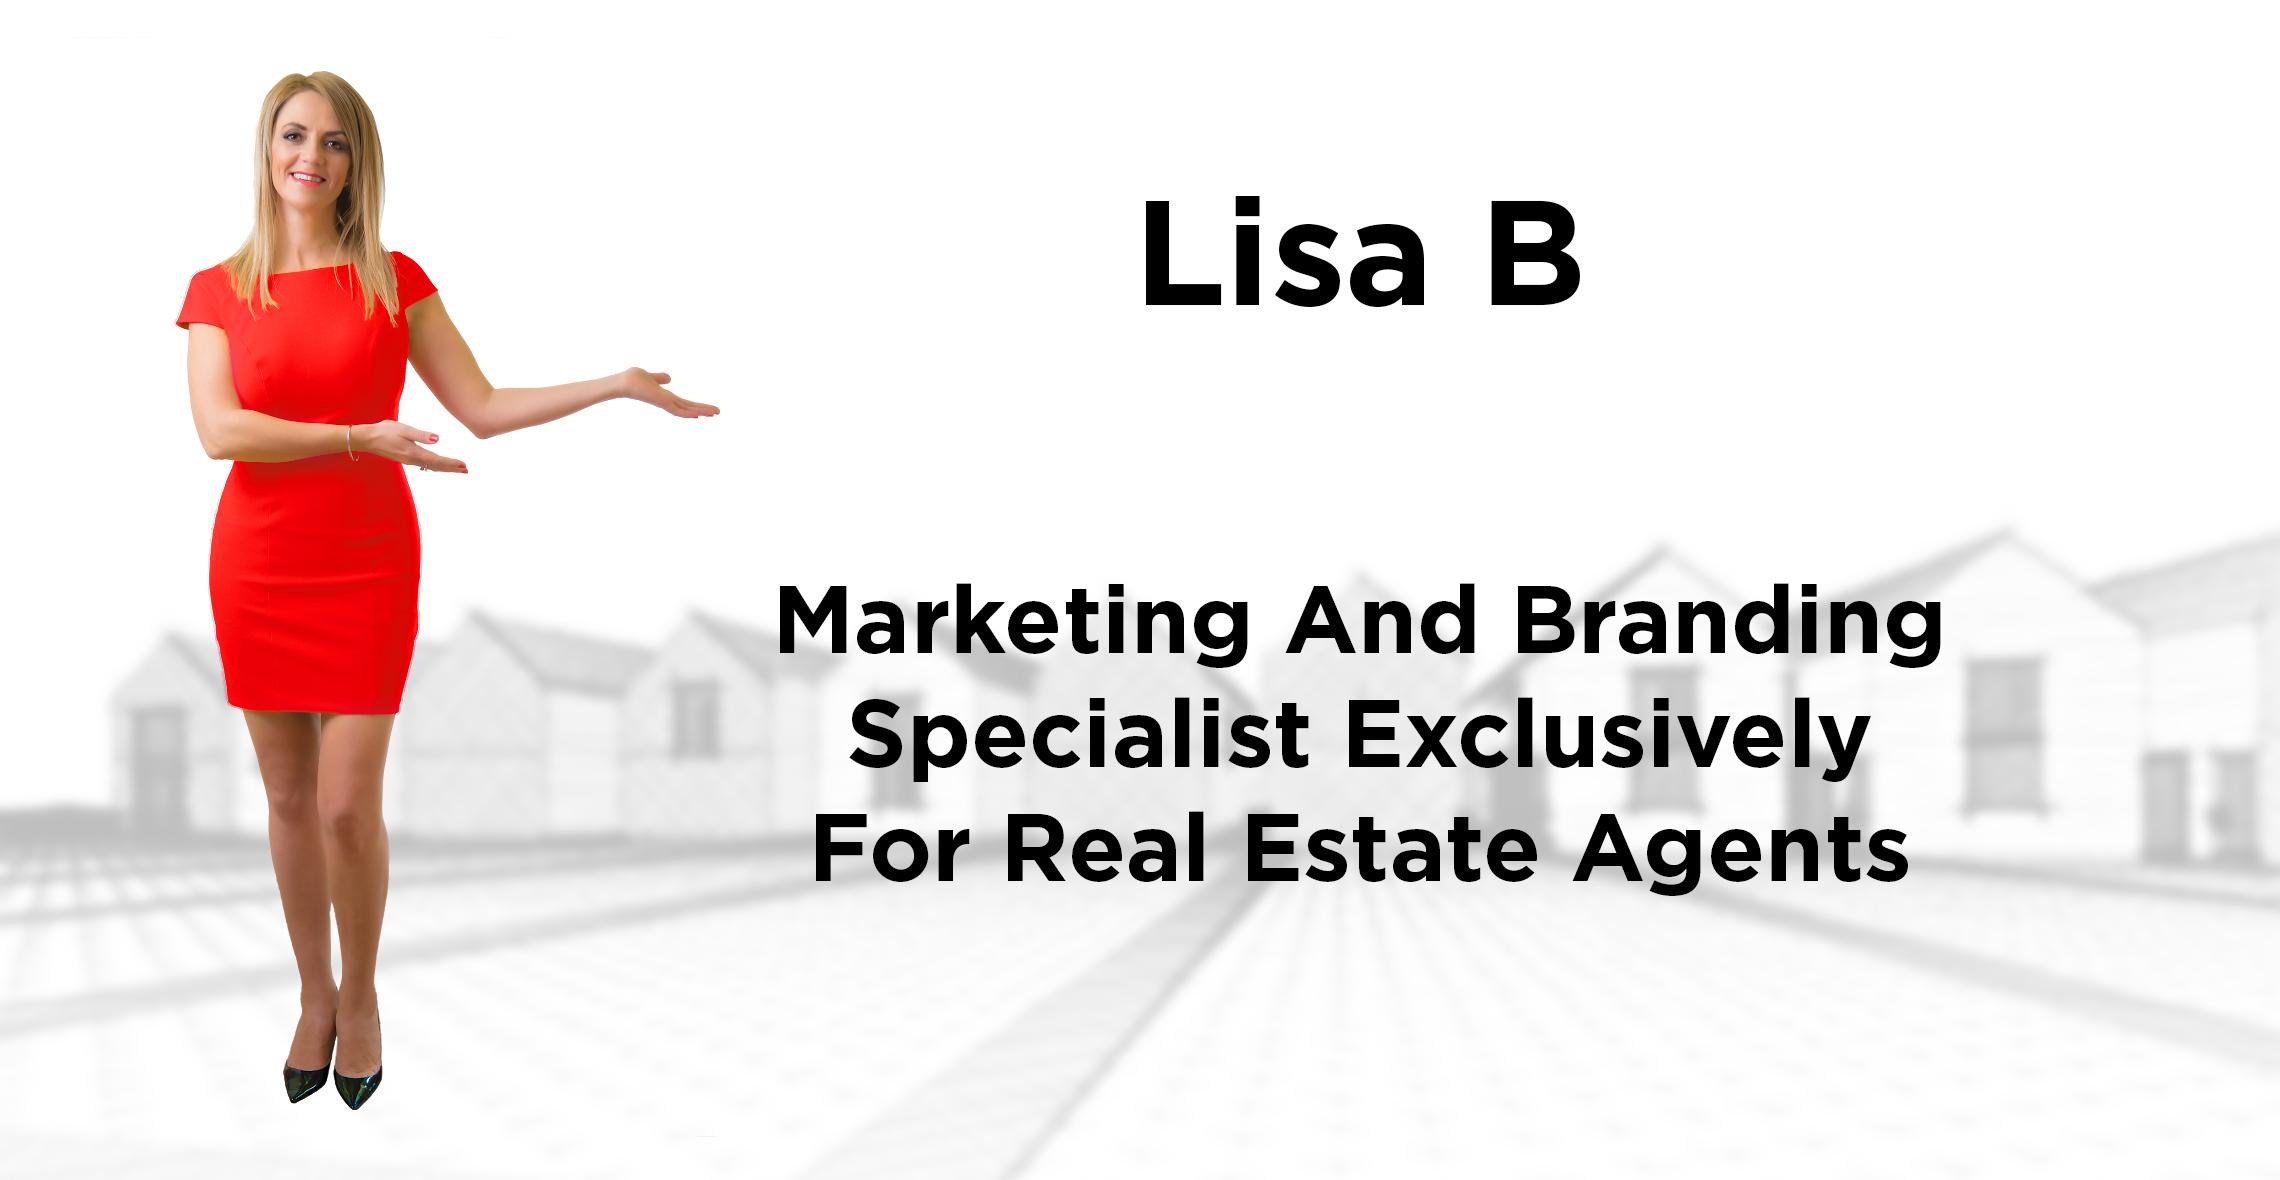 Lisa B Dominate the Internet